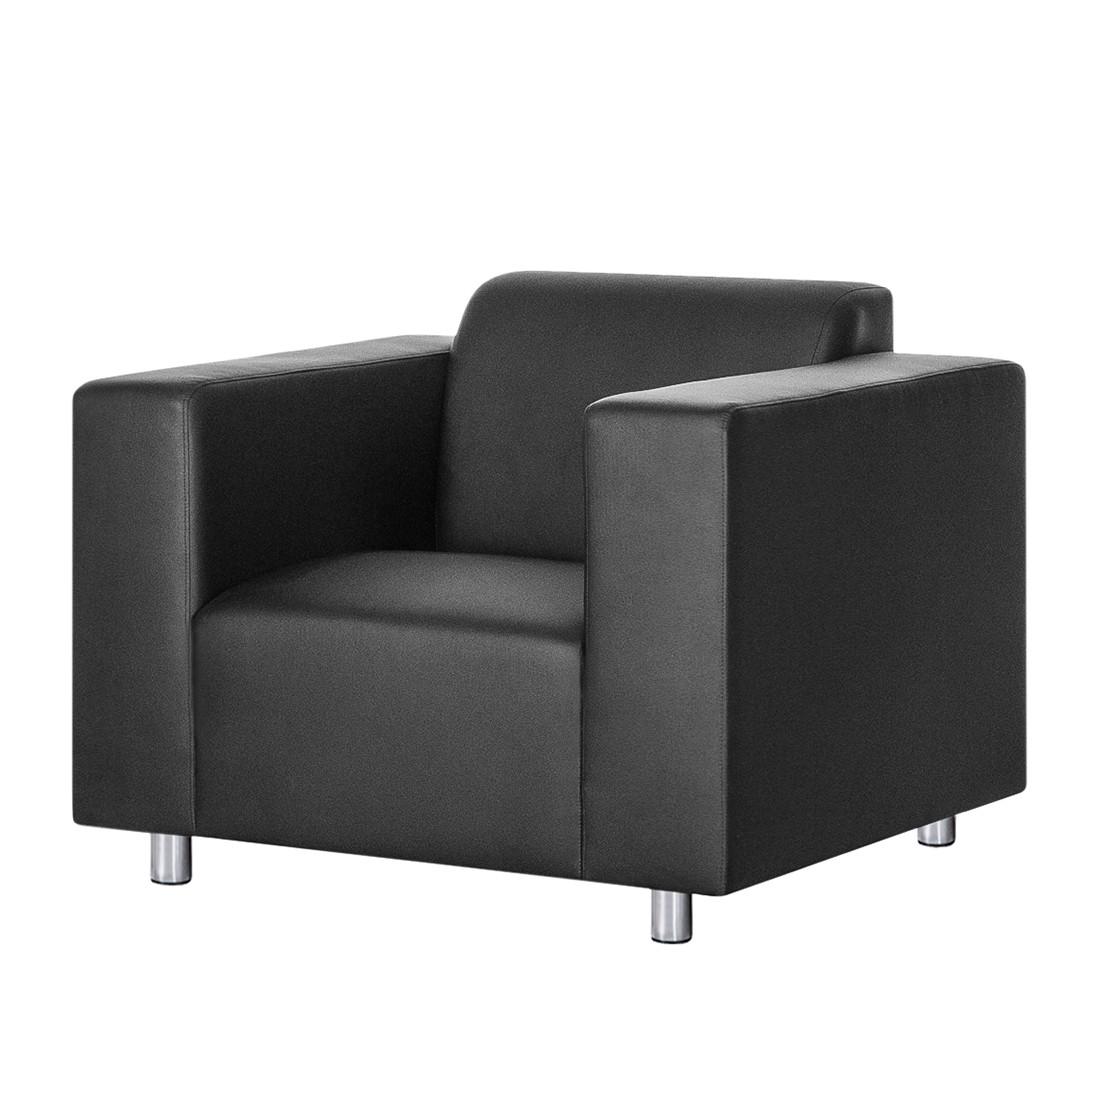 Fauteuil Oslo - Imitation cuir Noir, roomscape